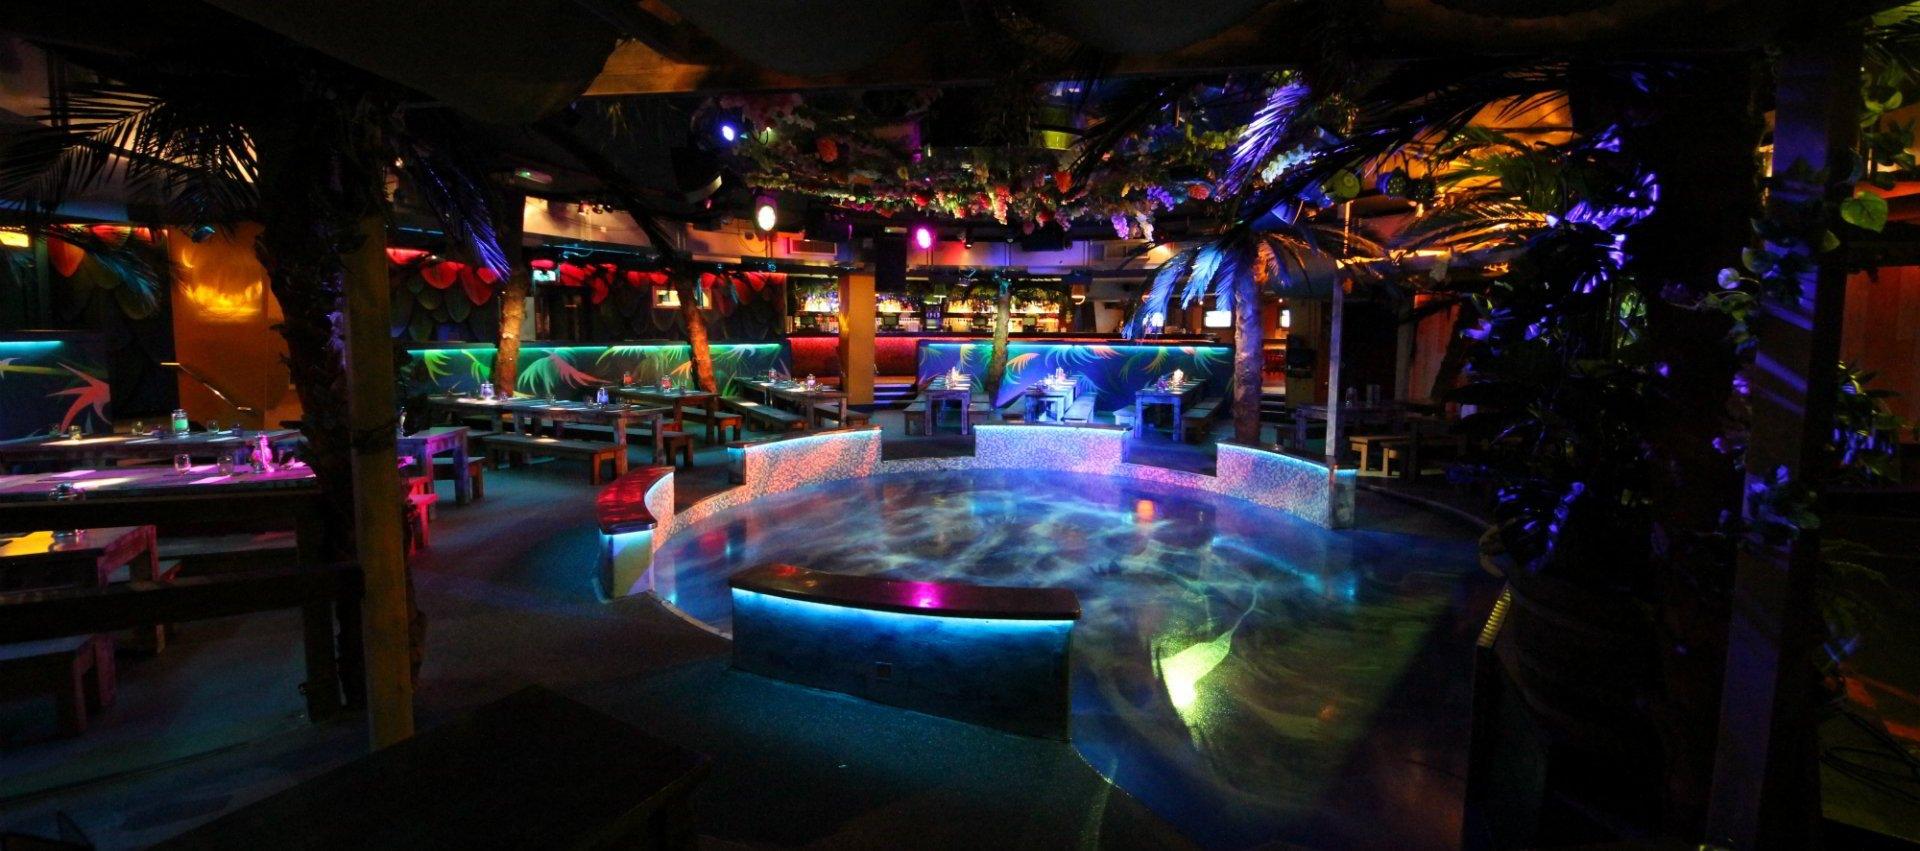 Club Tropicana Drinks Are Free Lyrics